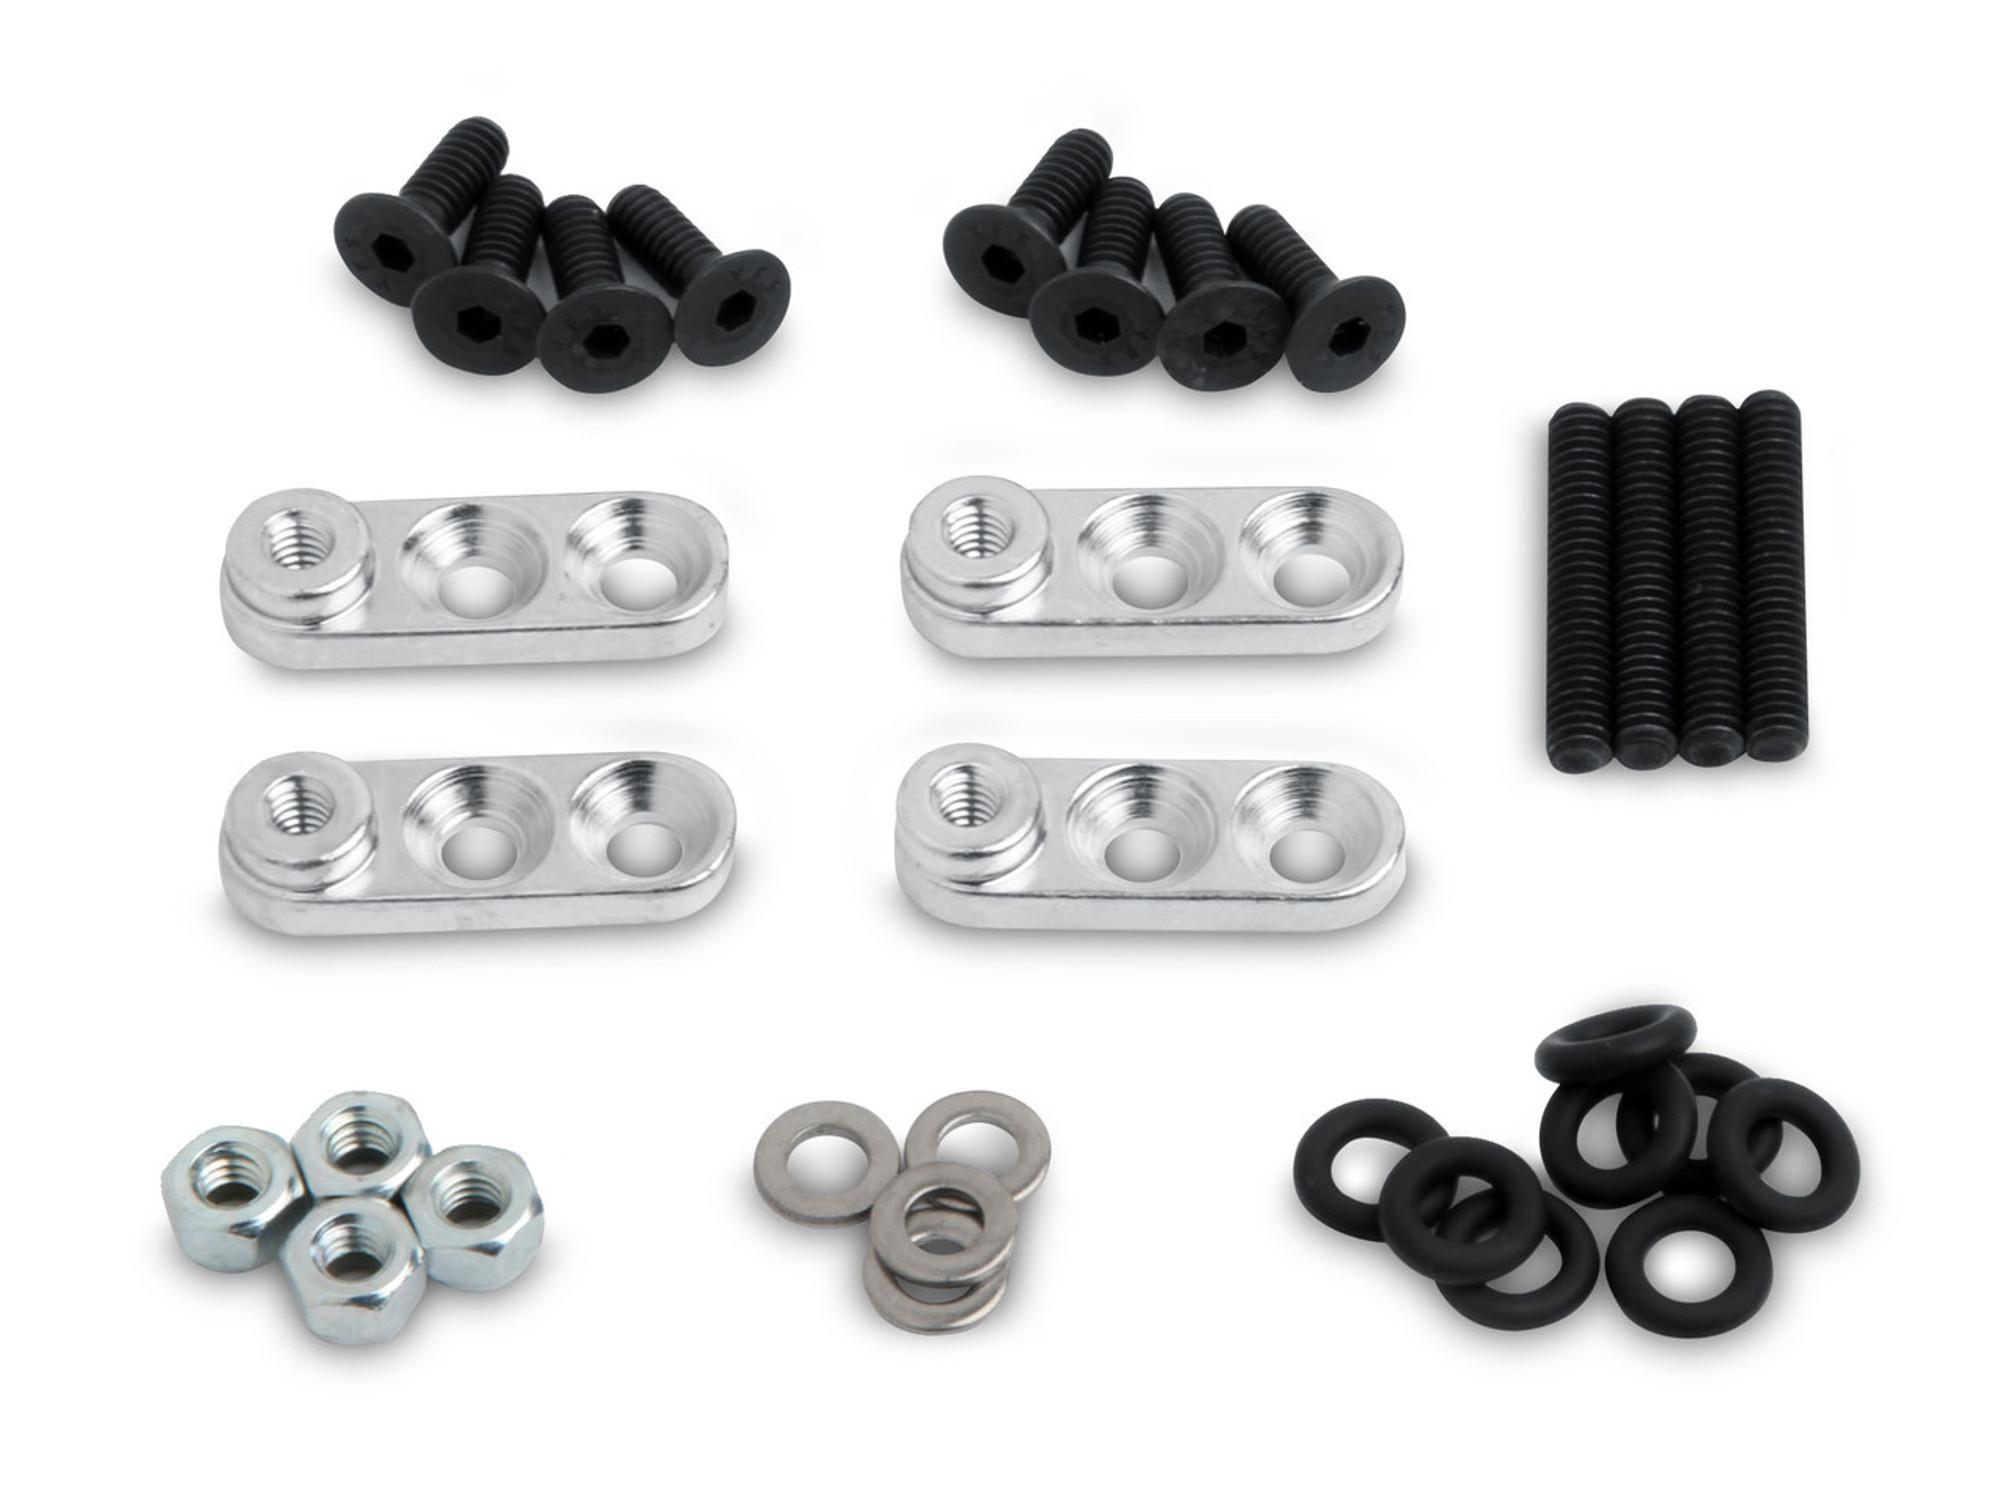 Holley Intake Manifold Hi-Ram Fuel Rail Adapter Kit for LS7 Injectors, Part  #300-230